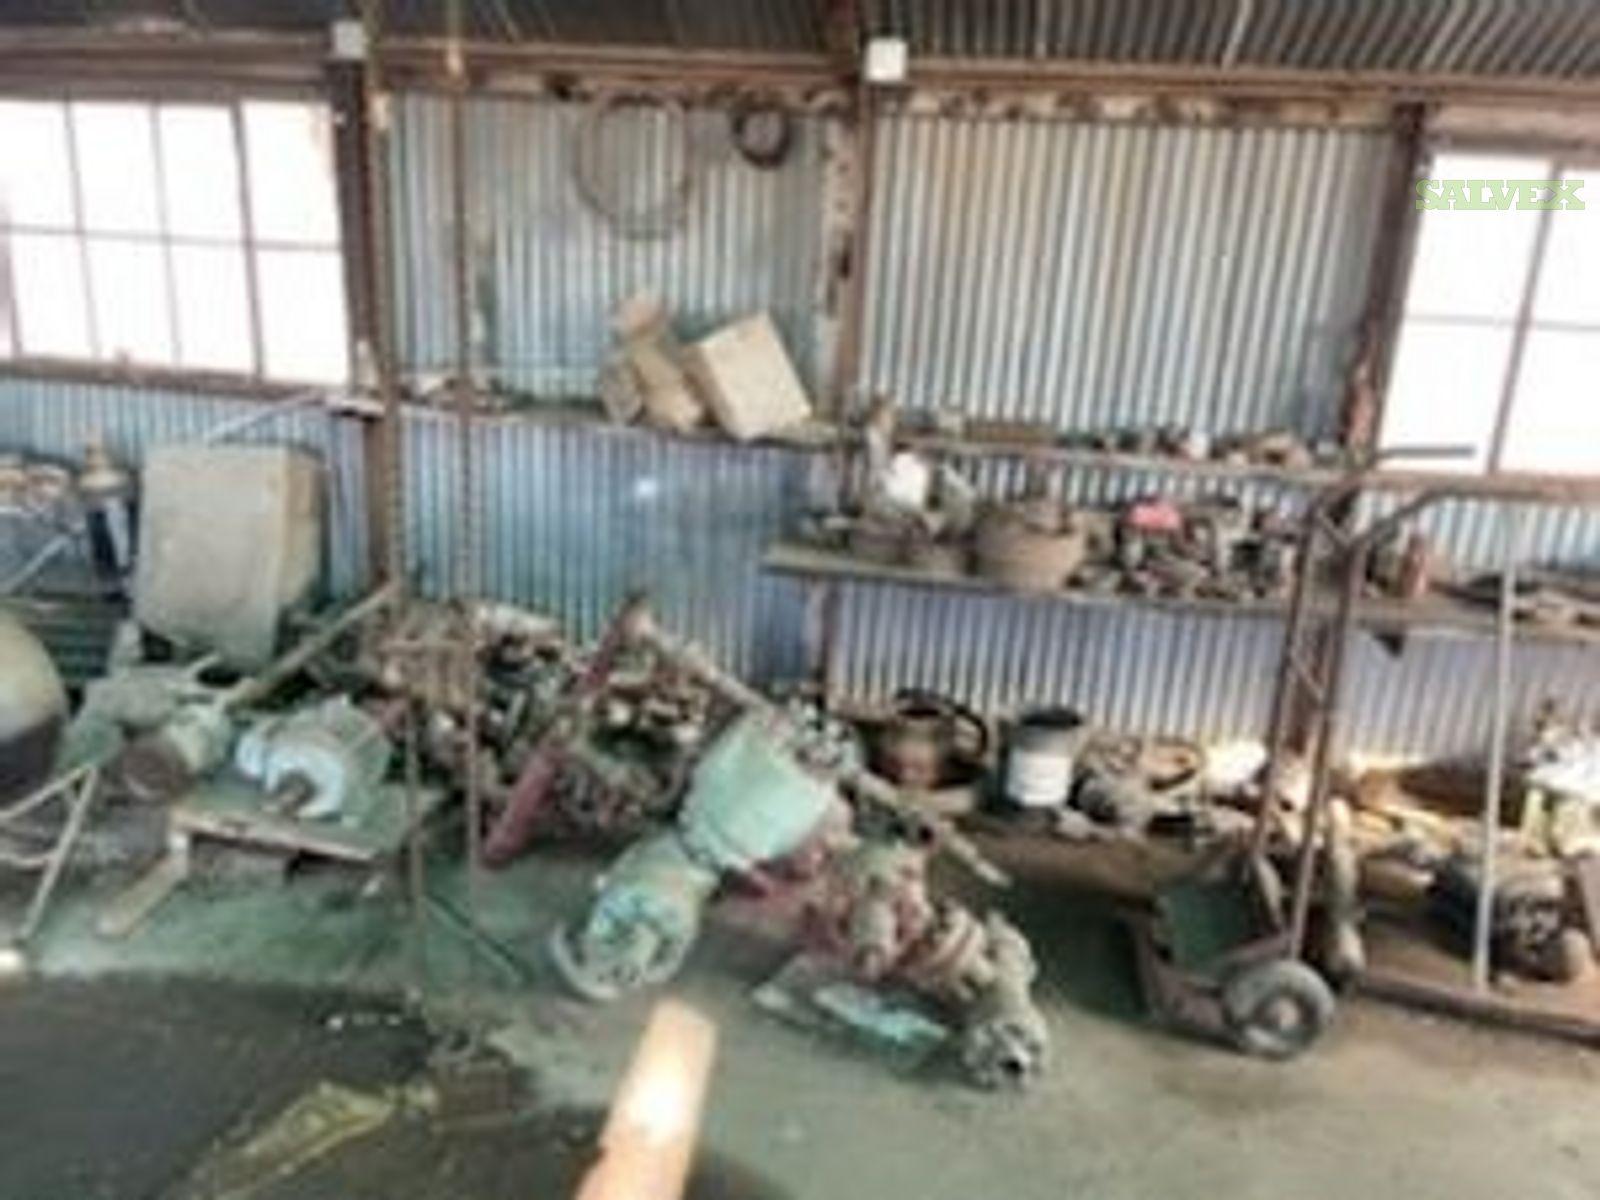 Pumping Units, Stairs/Railings, Motors, etc -34 Units